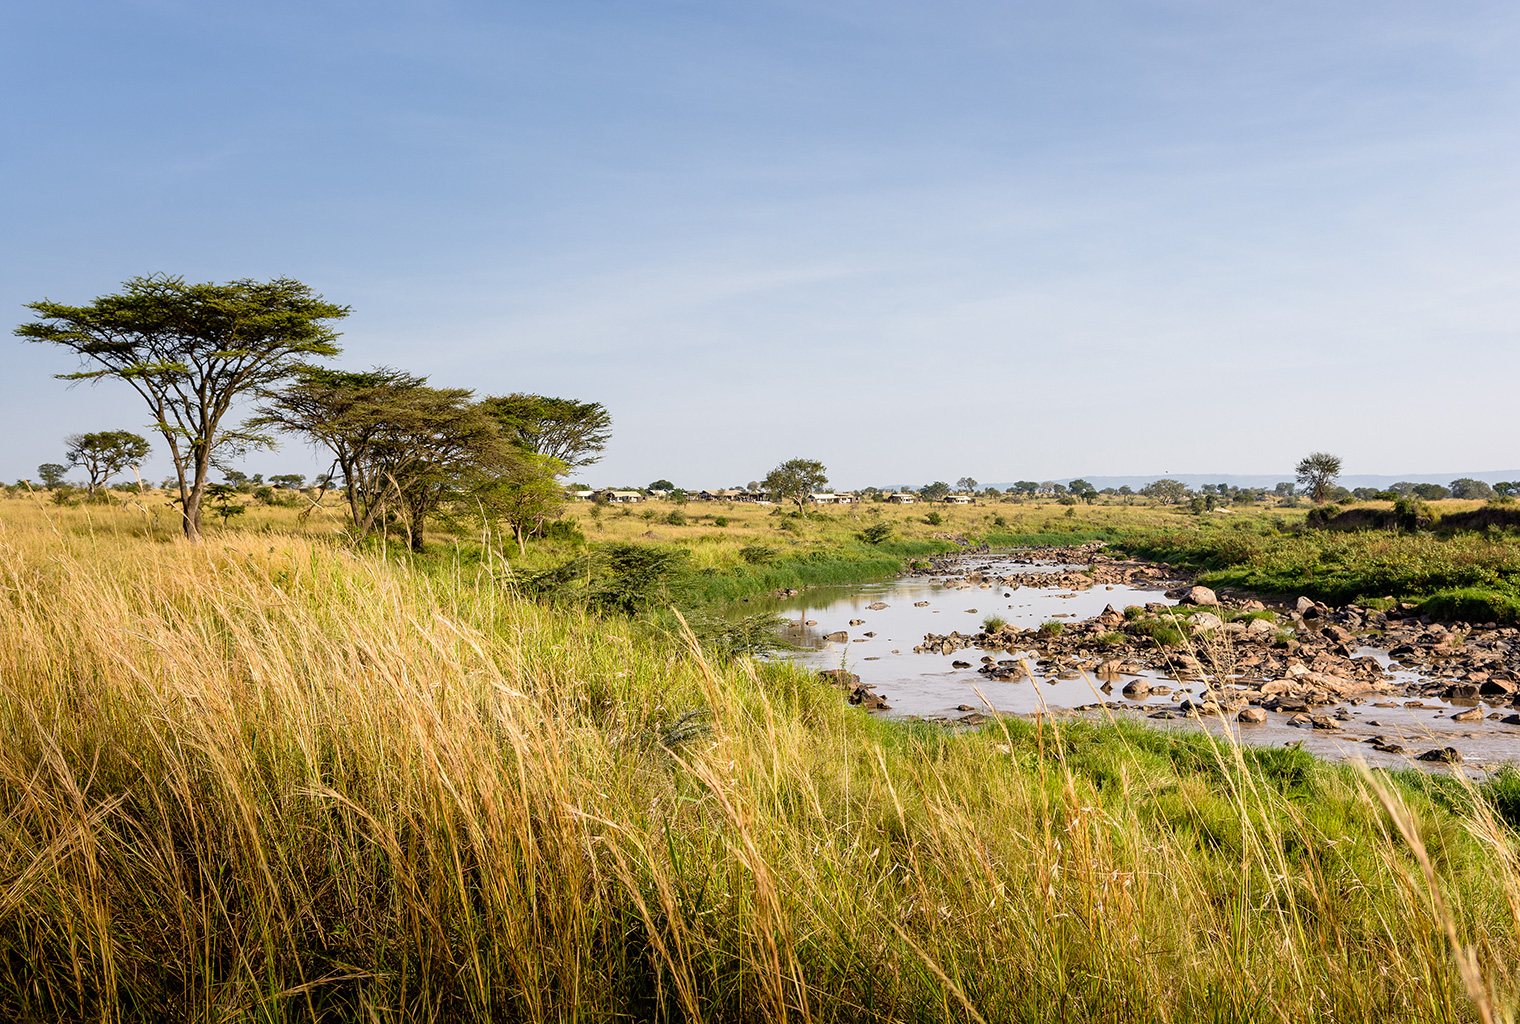 Singita-Mara-Tented-Camp-Tanzania-Landscape